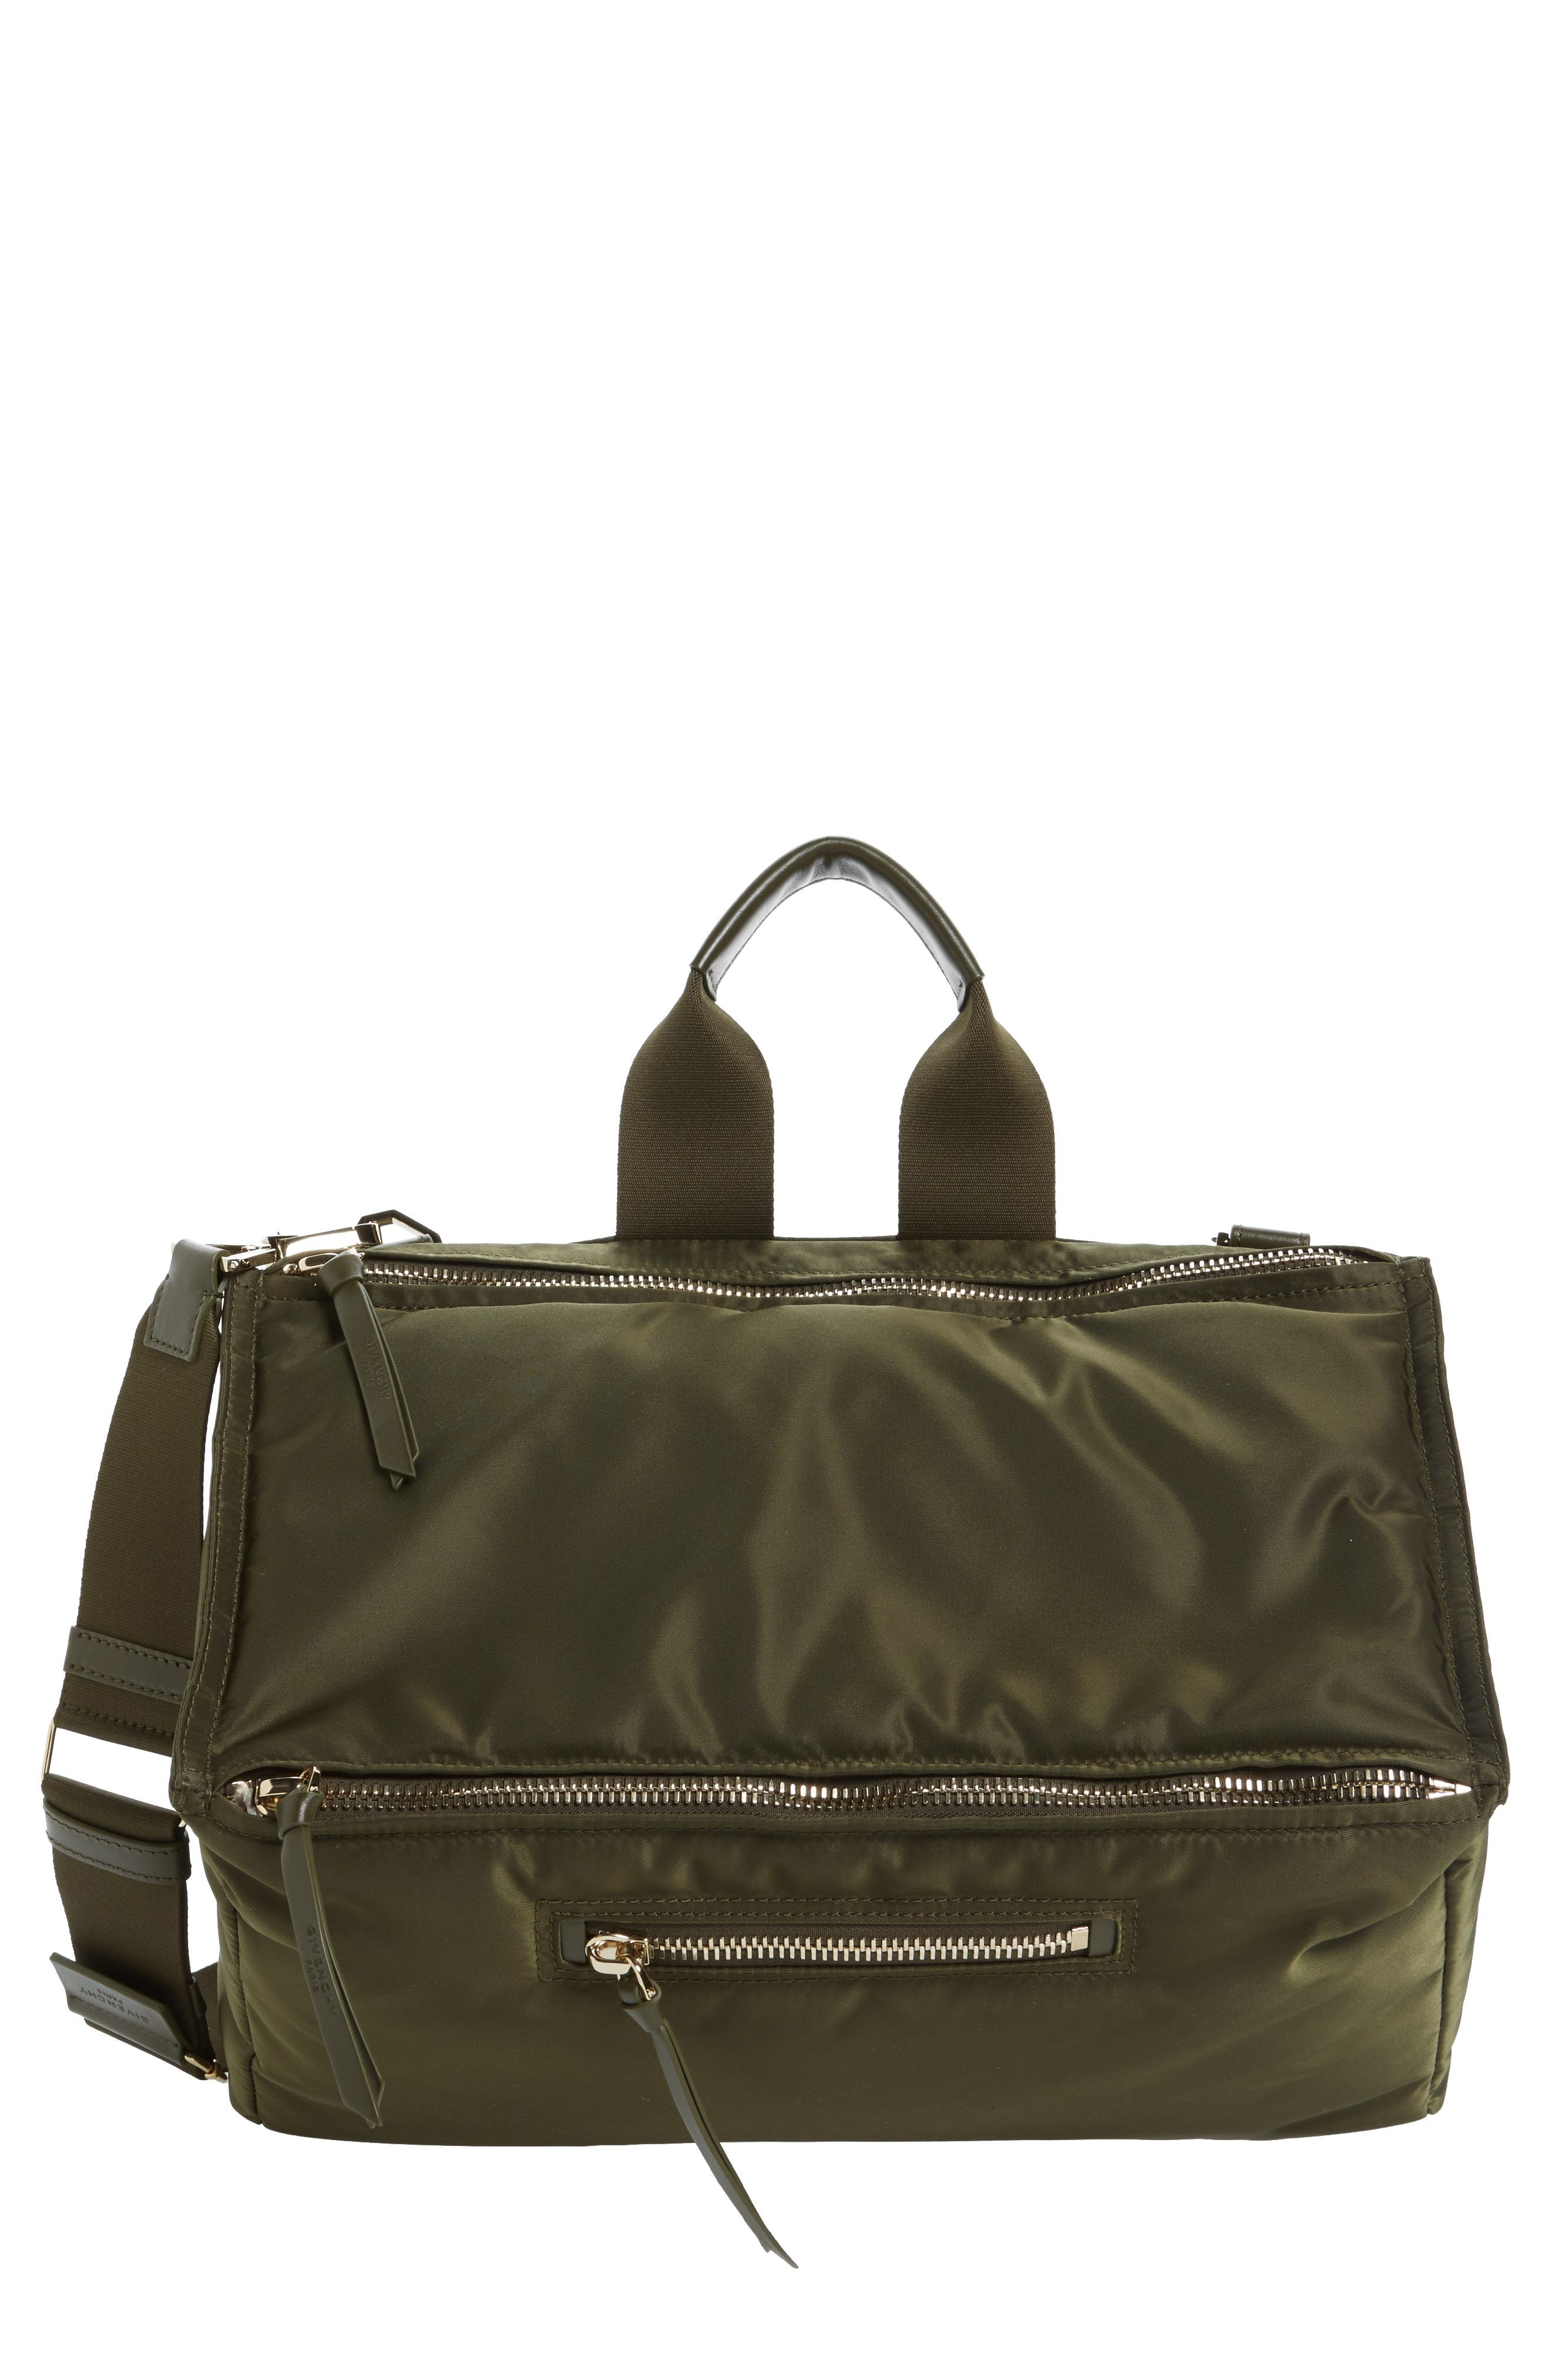 Givenchy Messenger Bag